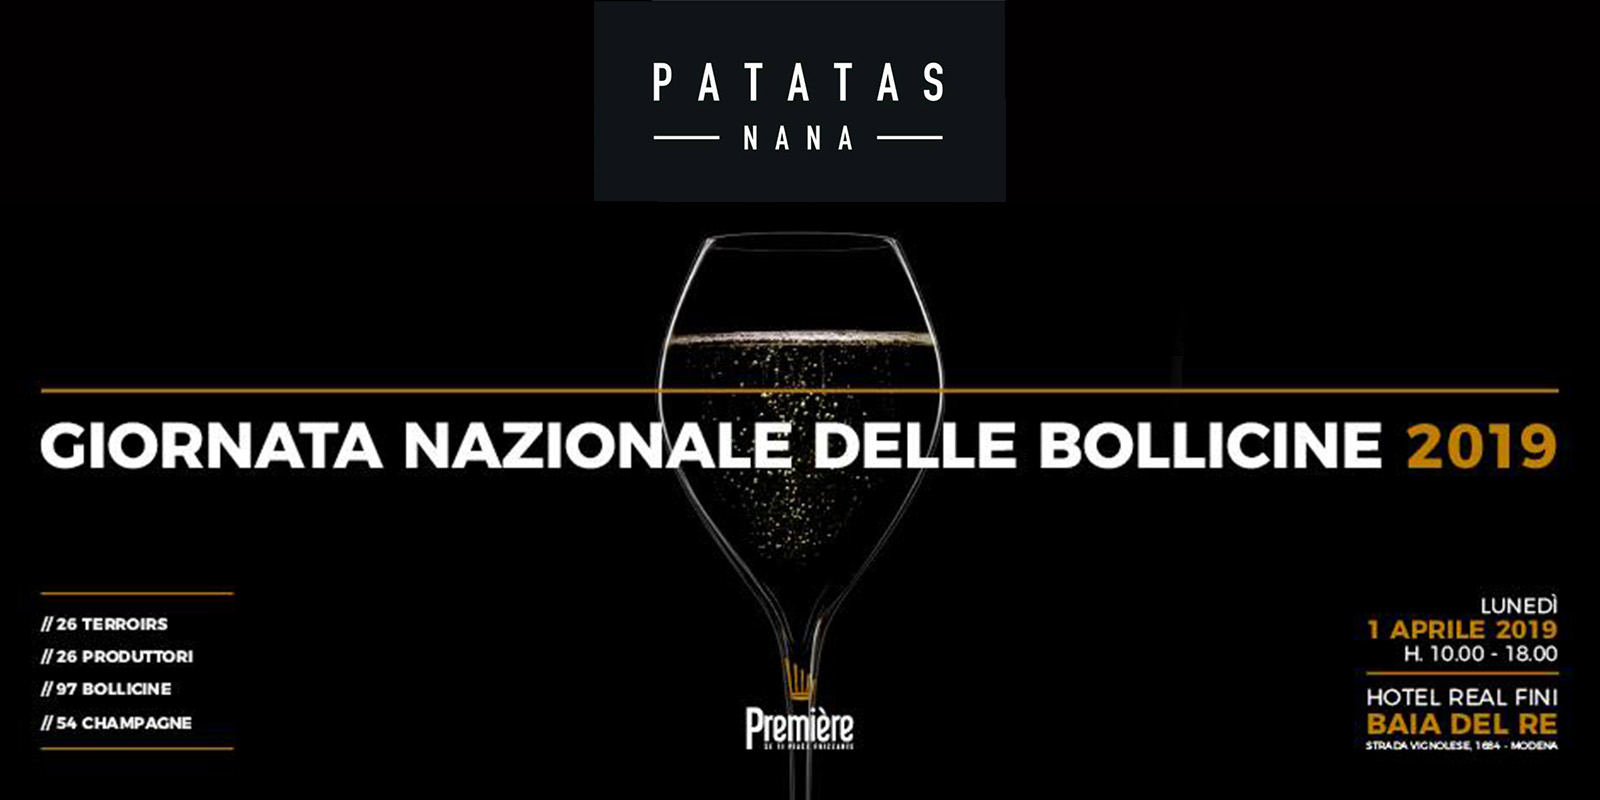 nana-evento-bollicine-modena-premiere